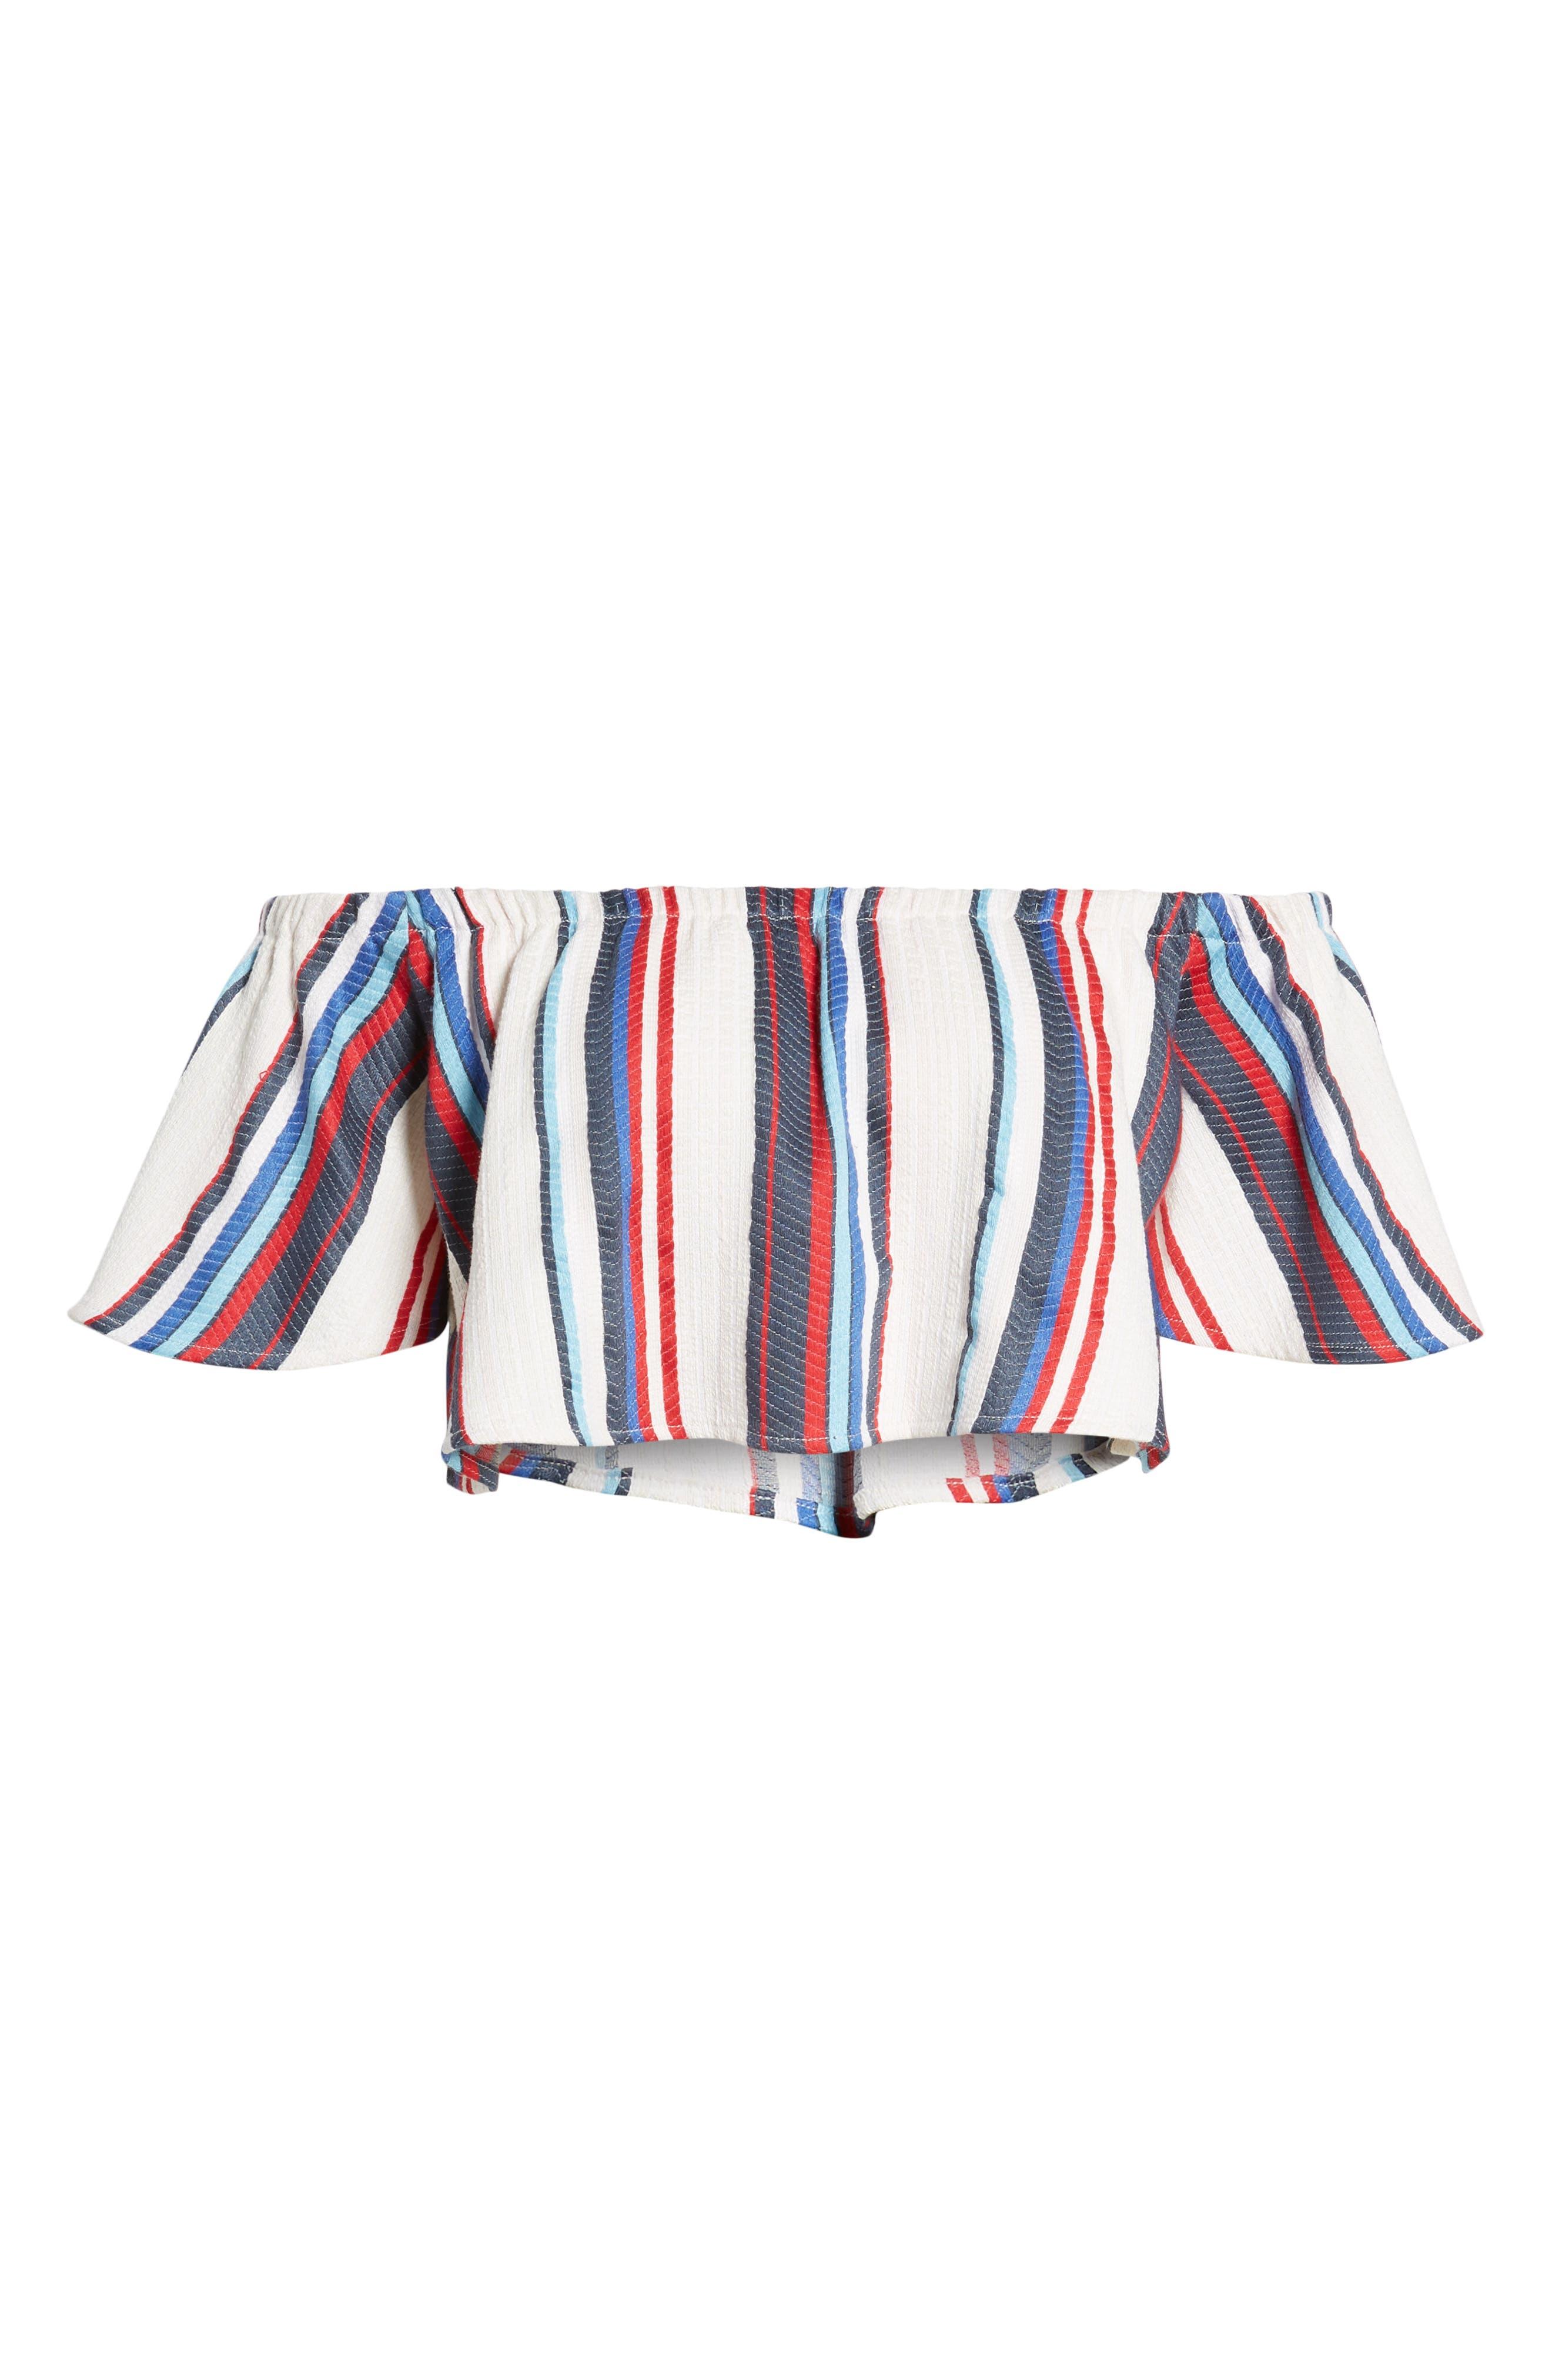 LOST + WANDER,                             Azul Stripe Off the Shoulder Crop Top,                             Alternate thumbnail 7, color,                             400